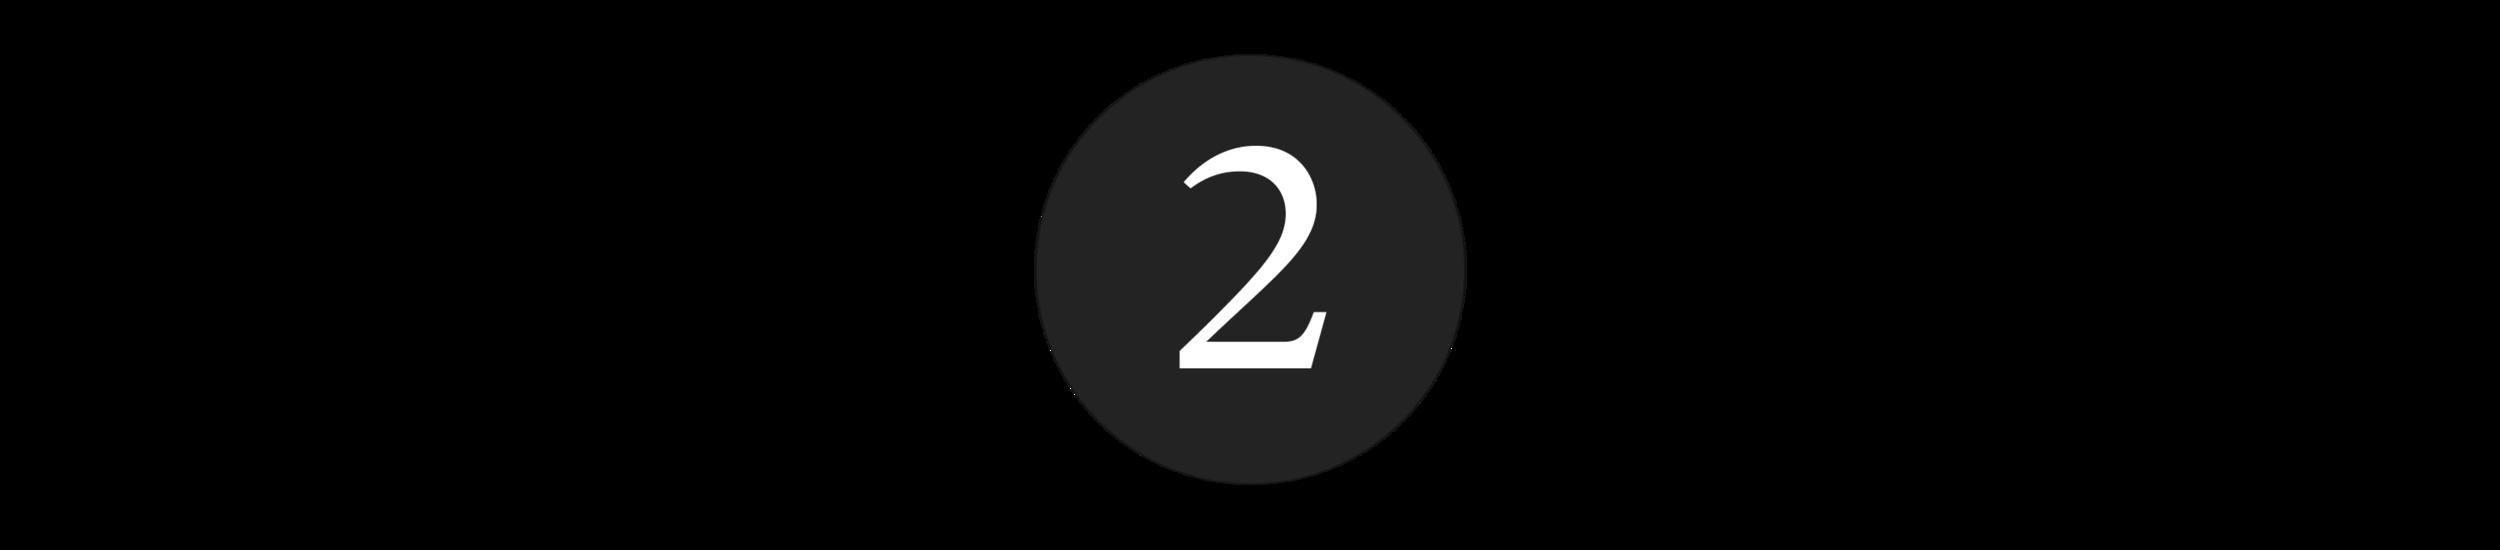 2.png